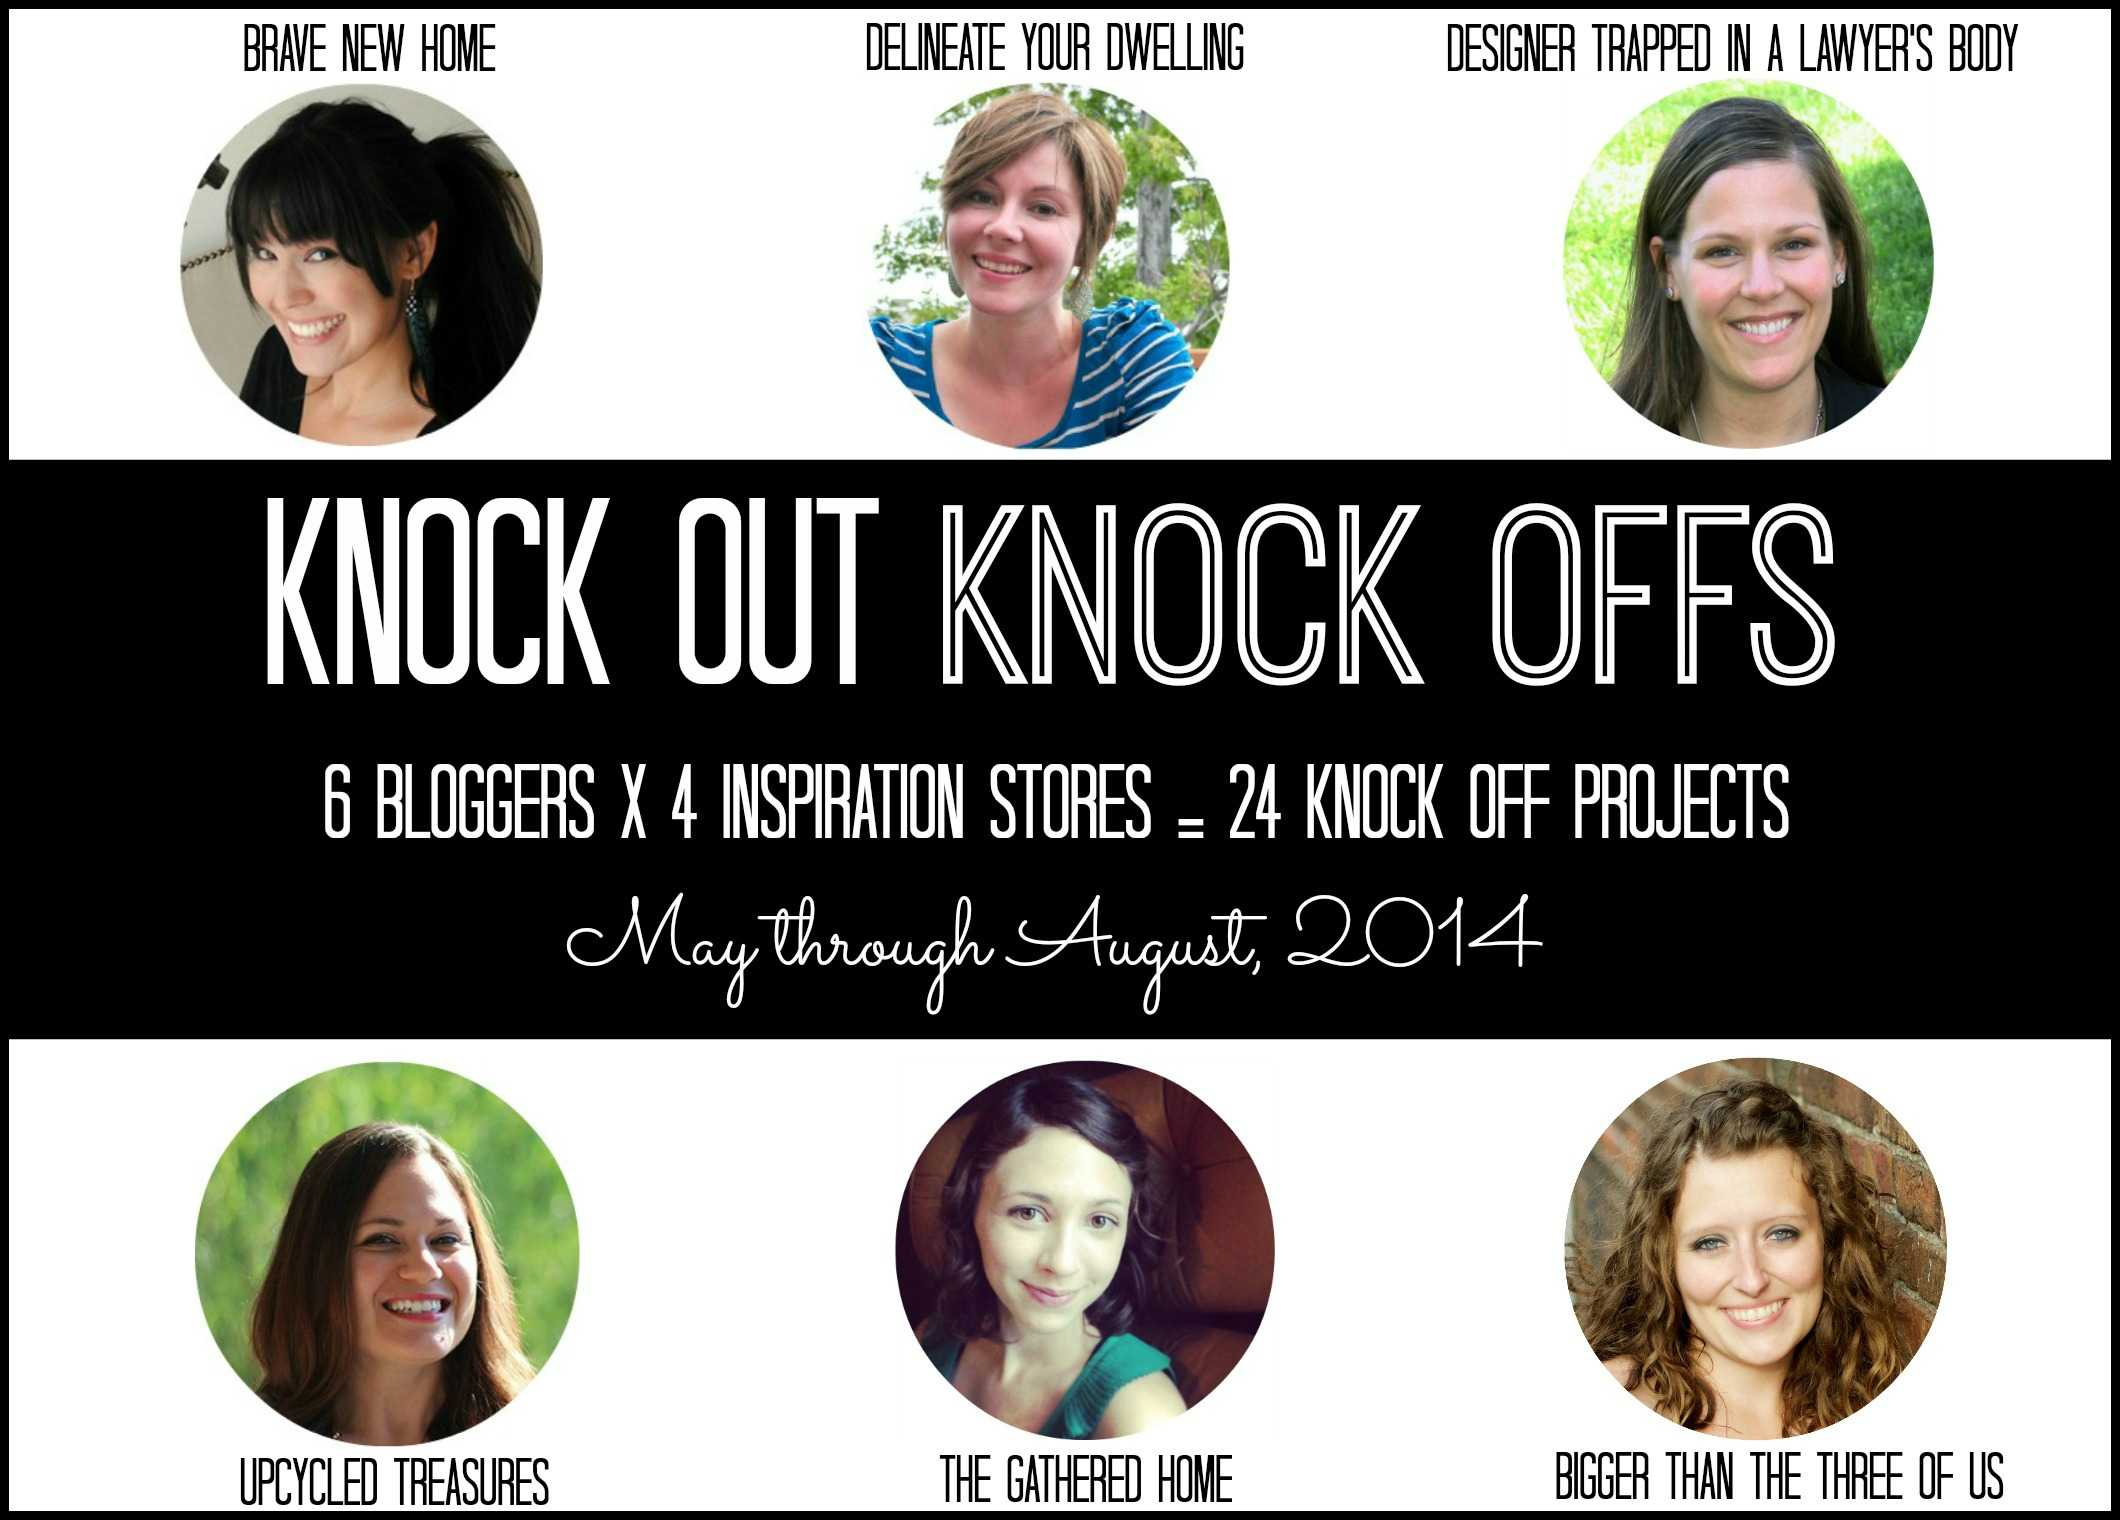 Knock Out Knock Offs: Zara Home Insect Vase | Designertrapped com